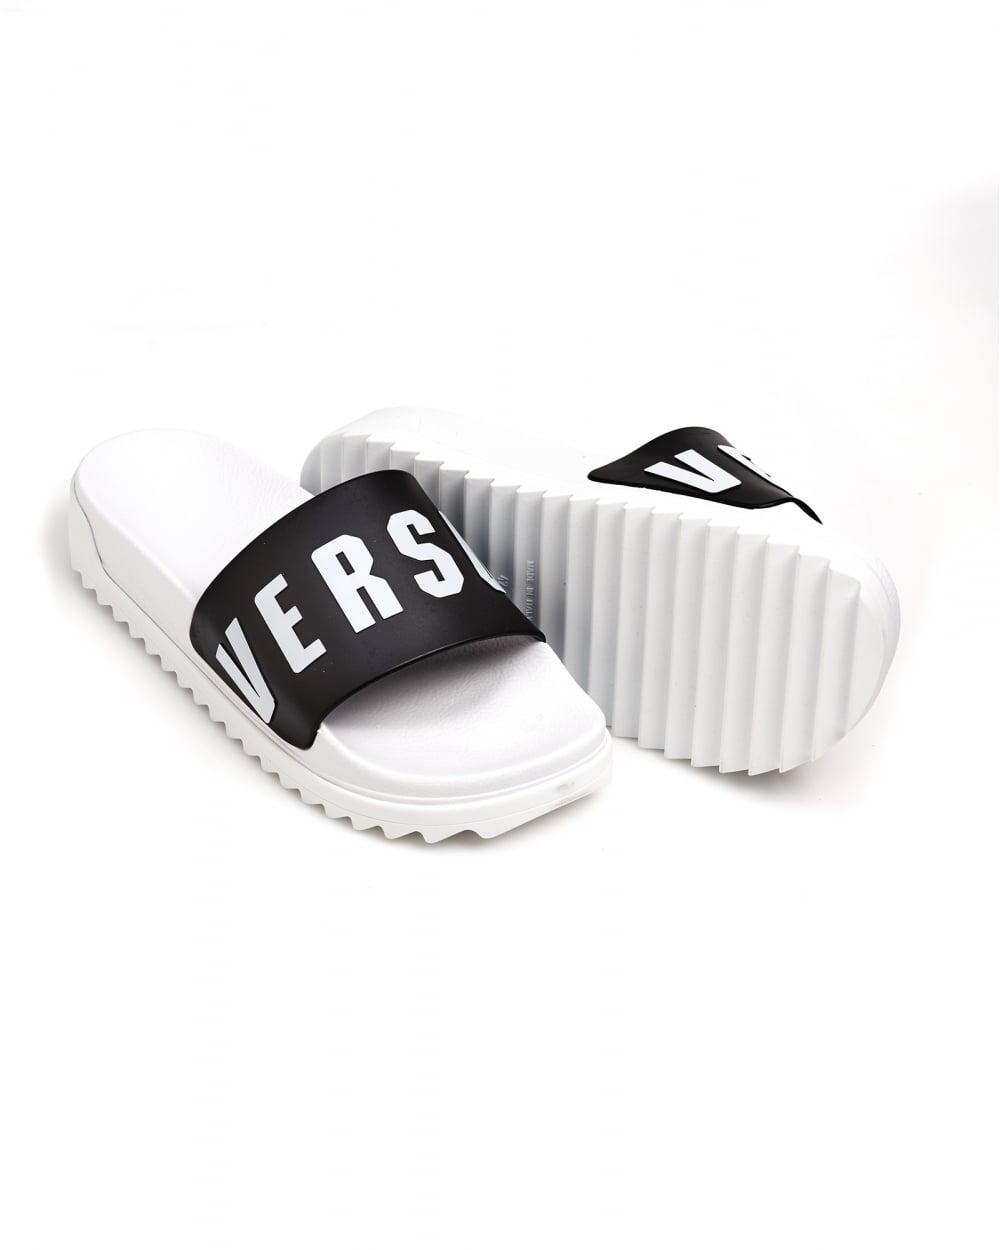 9fb9c02a0405 Versus Versace Mens Rubber Sliders